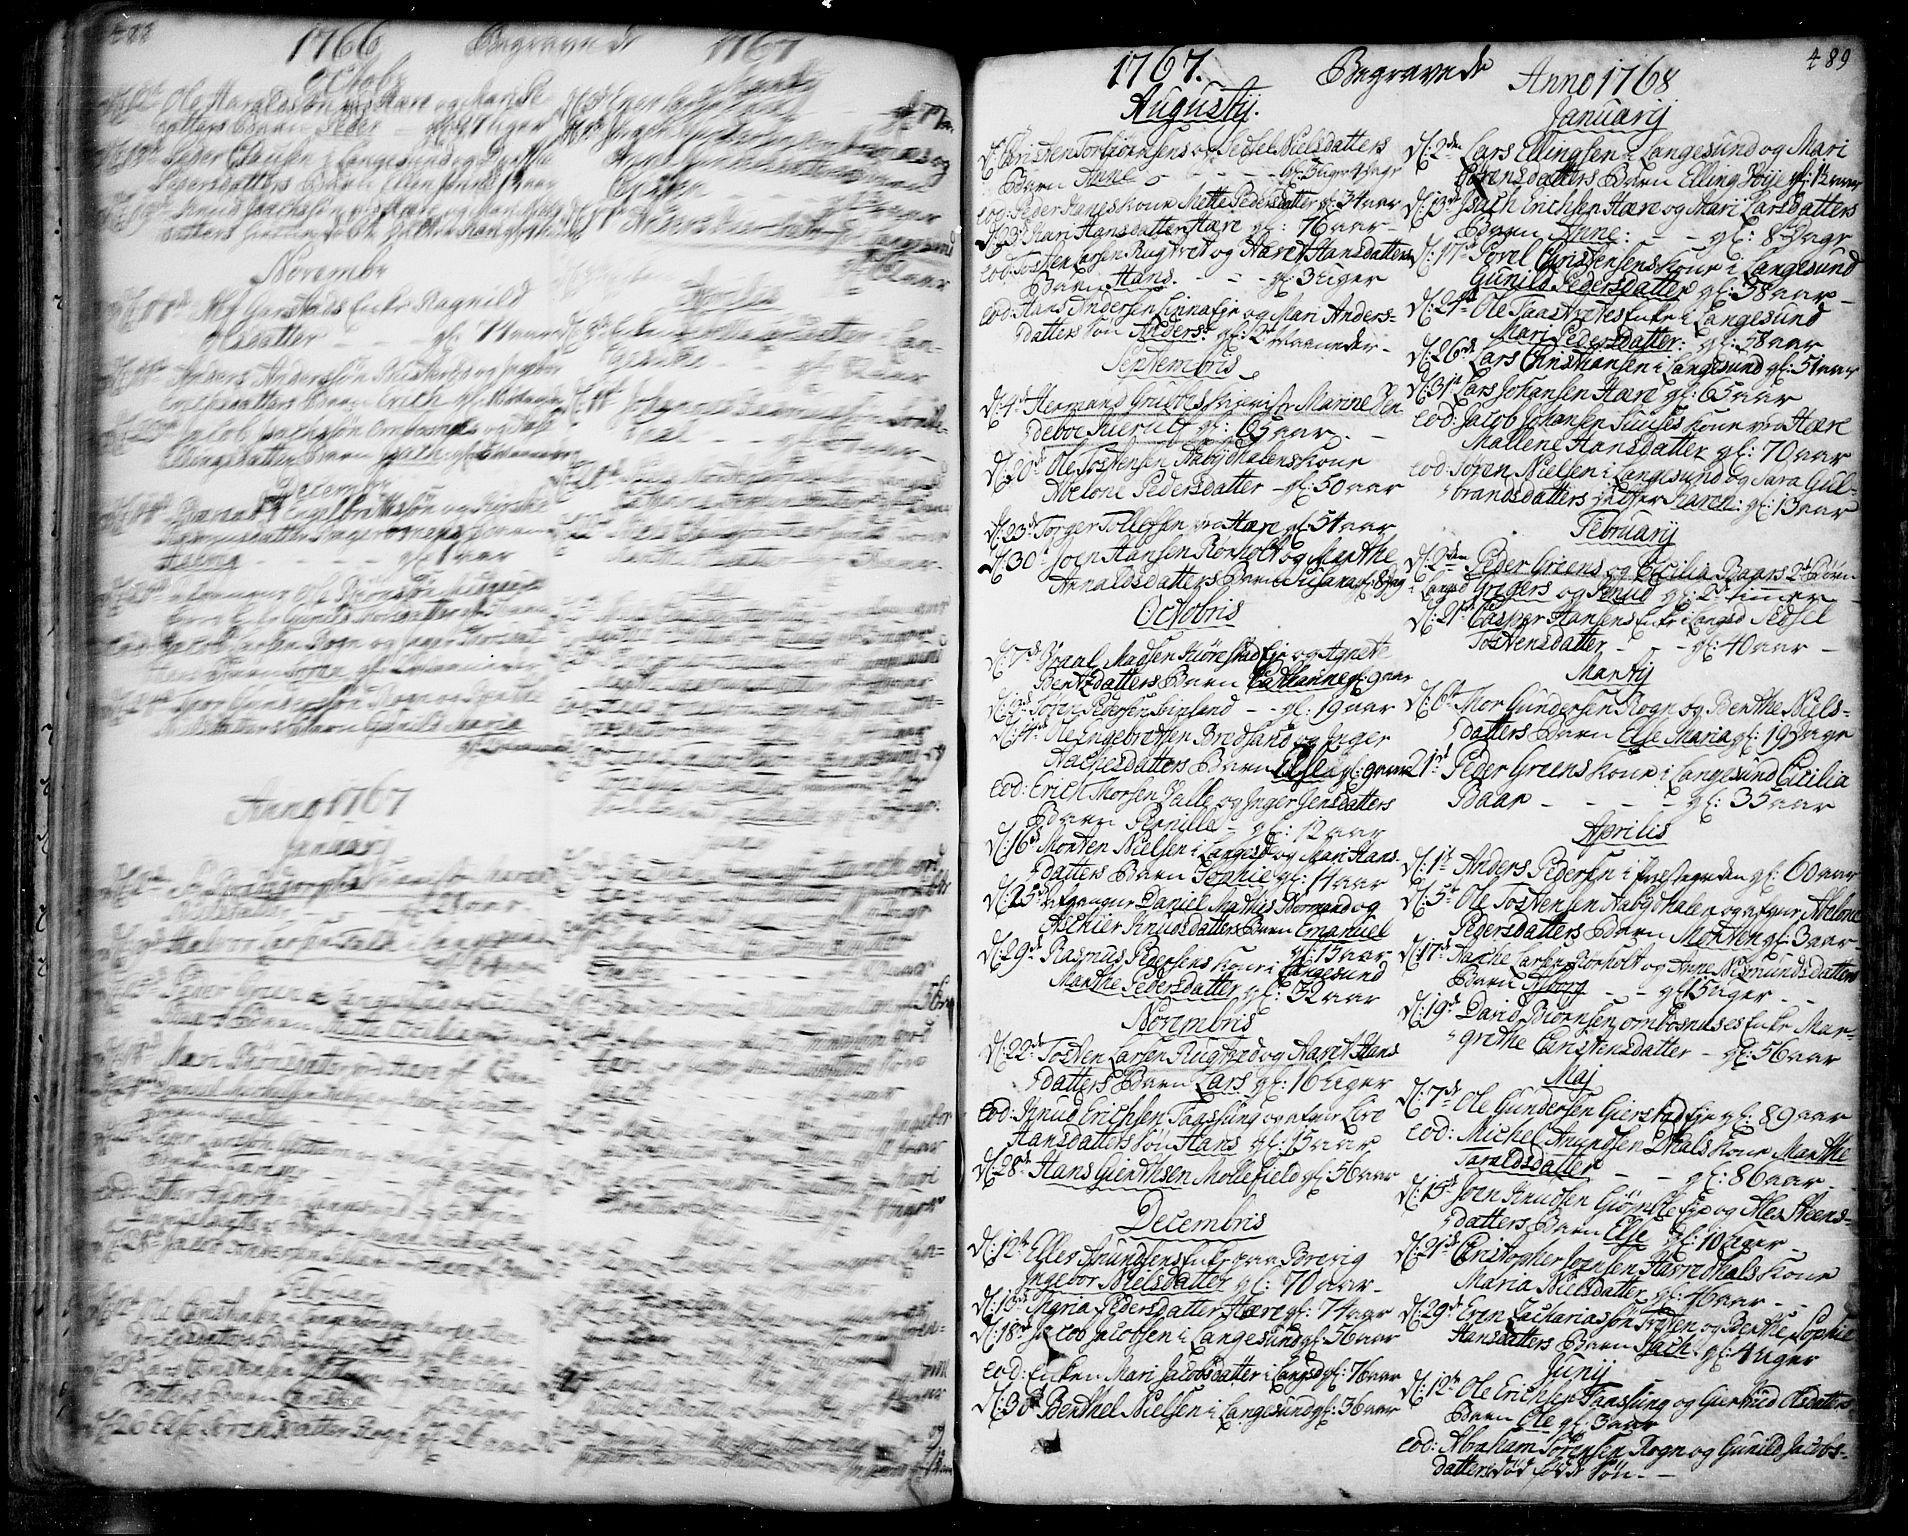 SAKO, Bamble kirkebøker, F/Fa/L0001: Ministerialbok nr. I 1, 1702-1774, s. 488-489